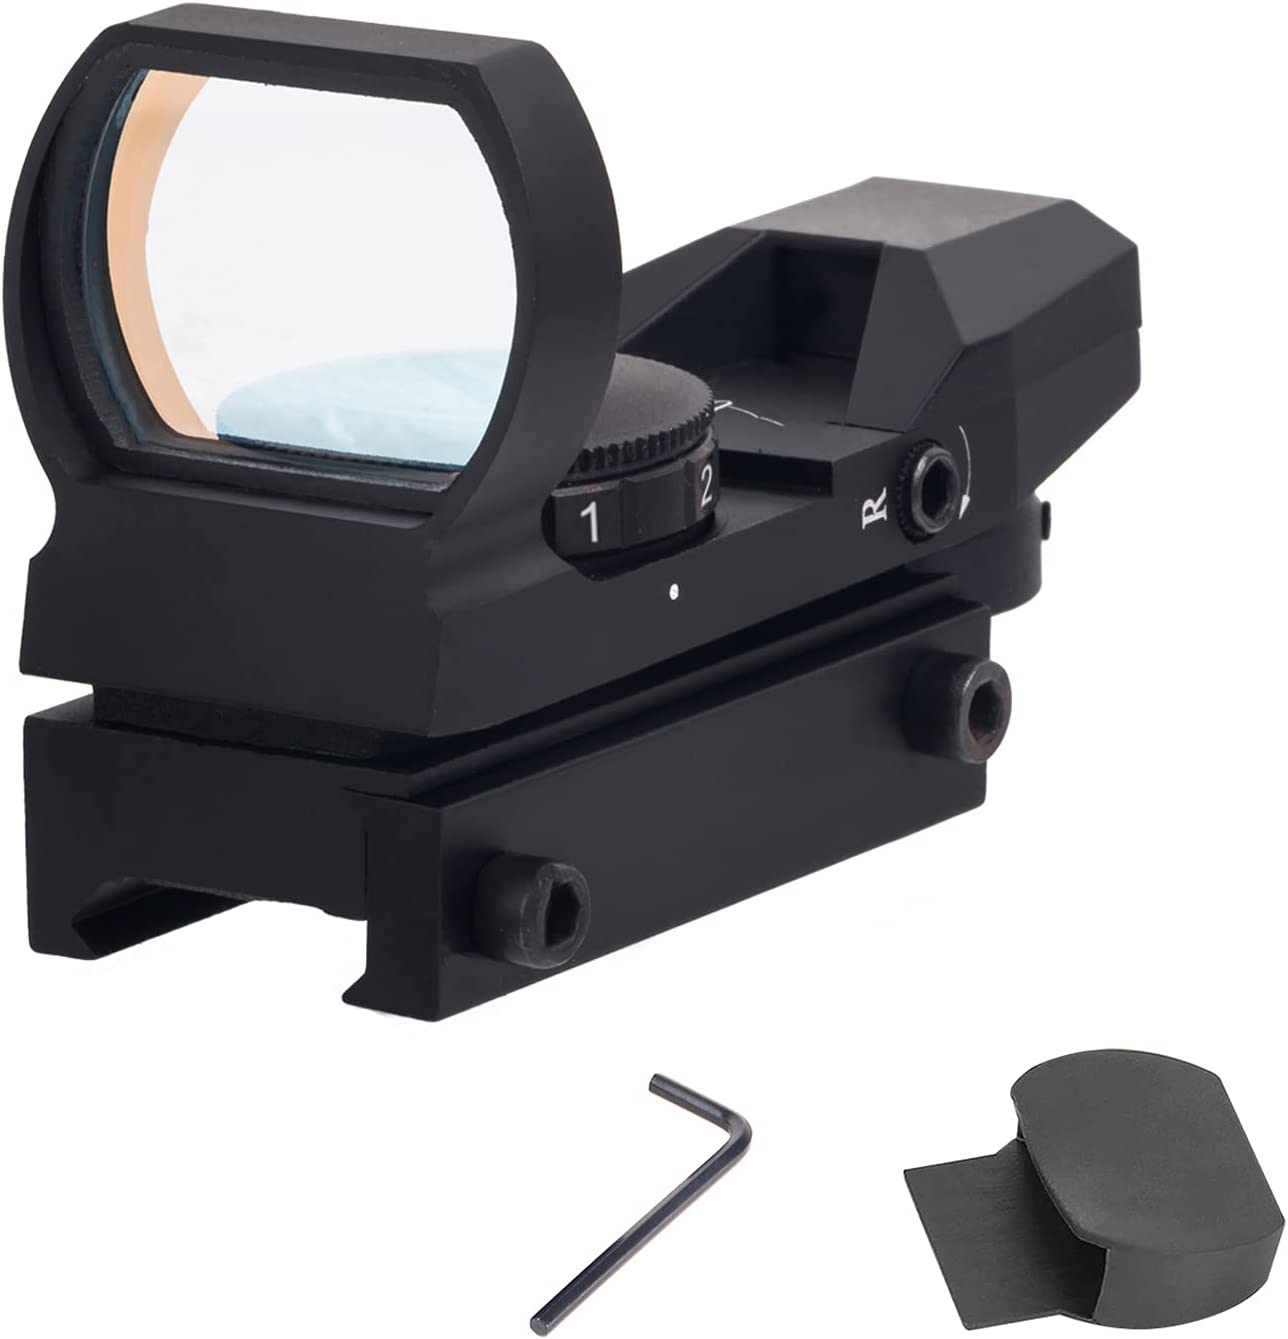 Taktisch Jagd Reflex 4 Reticle Rot Grün Leuchtpunktvisier Rail Gewehr Dot Sight